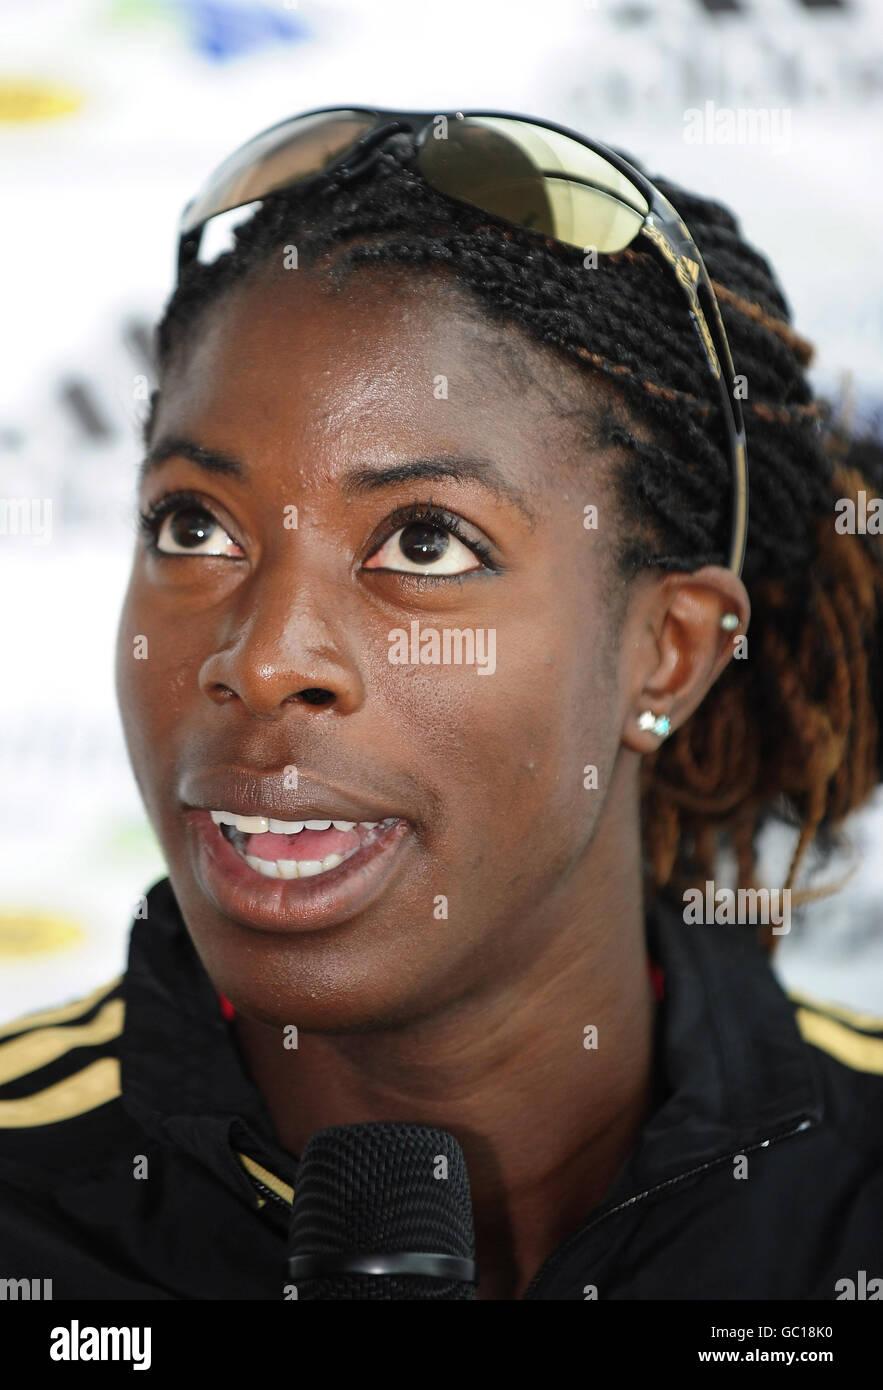 Athletics - IAAF World Athletics Championships - UK Athletics Press Conference - Radisson Blu Hotel - Stock Image